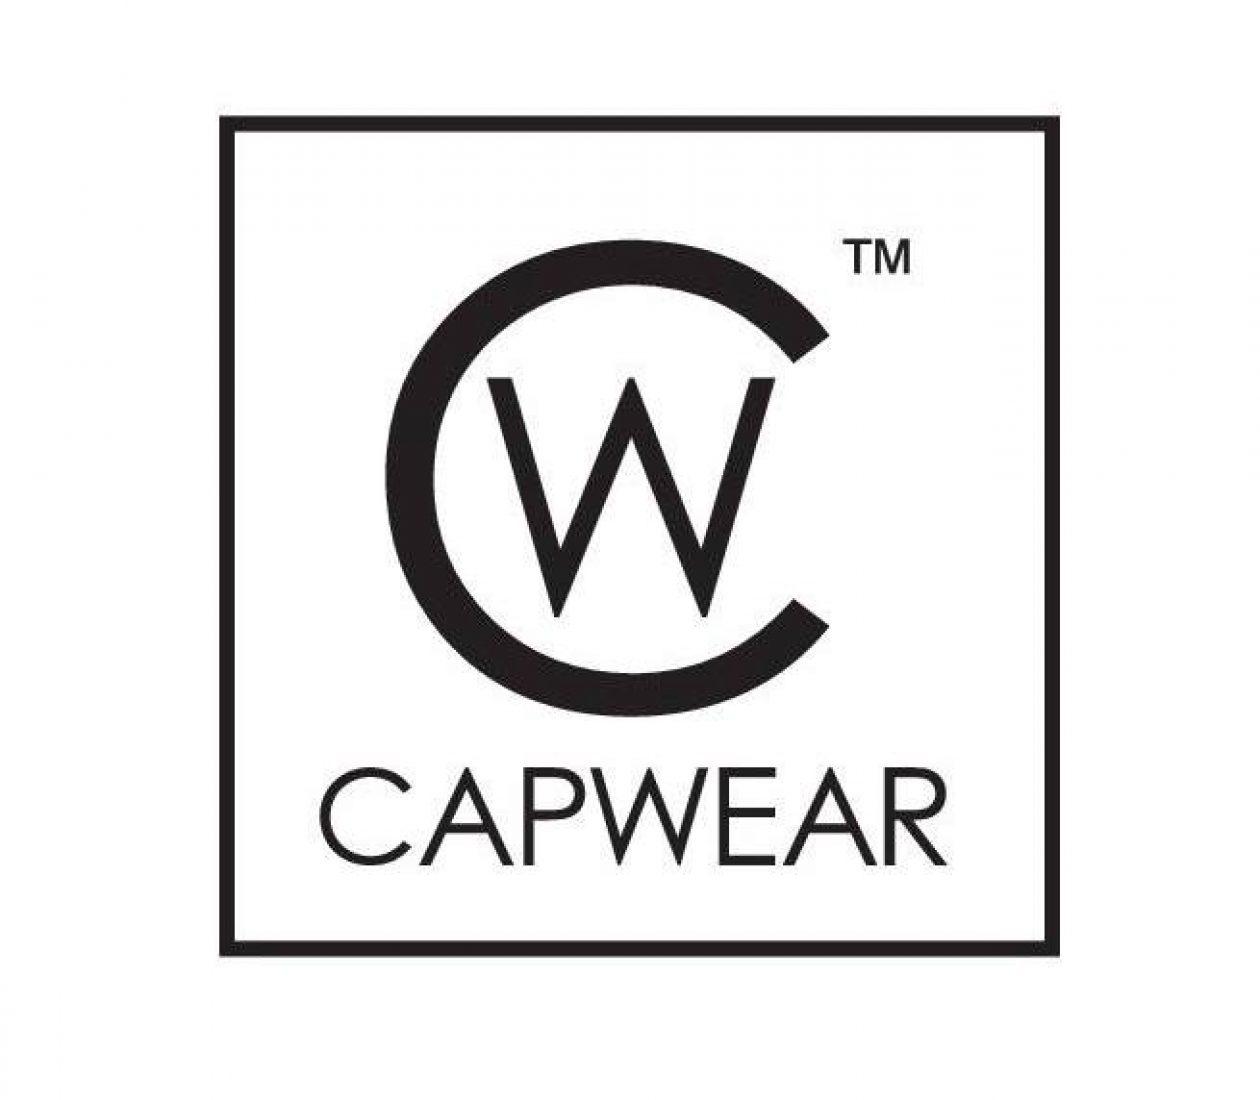 Capwear partner Macallesi 1927